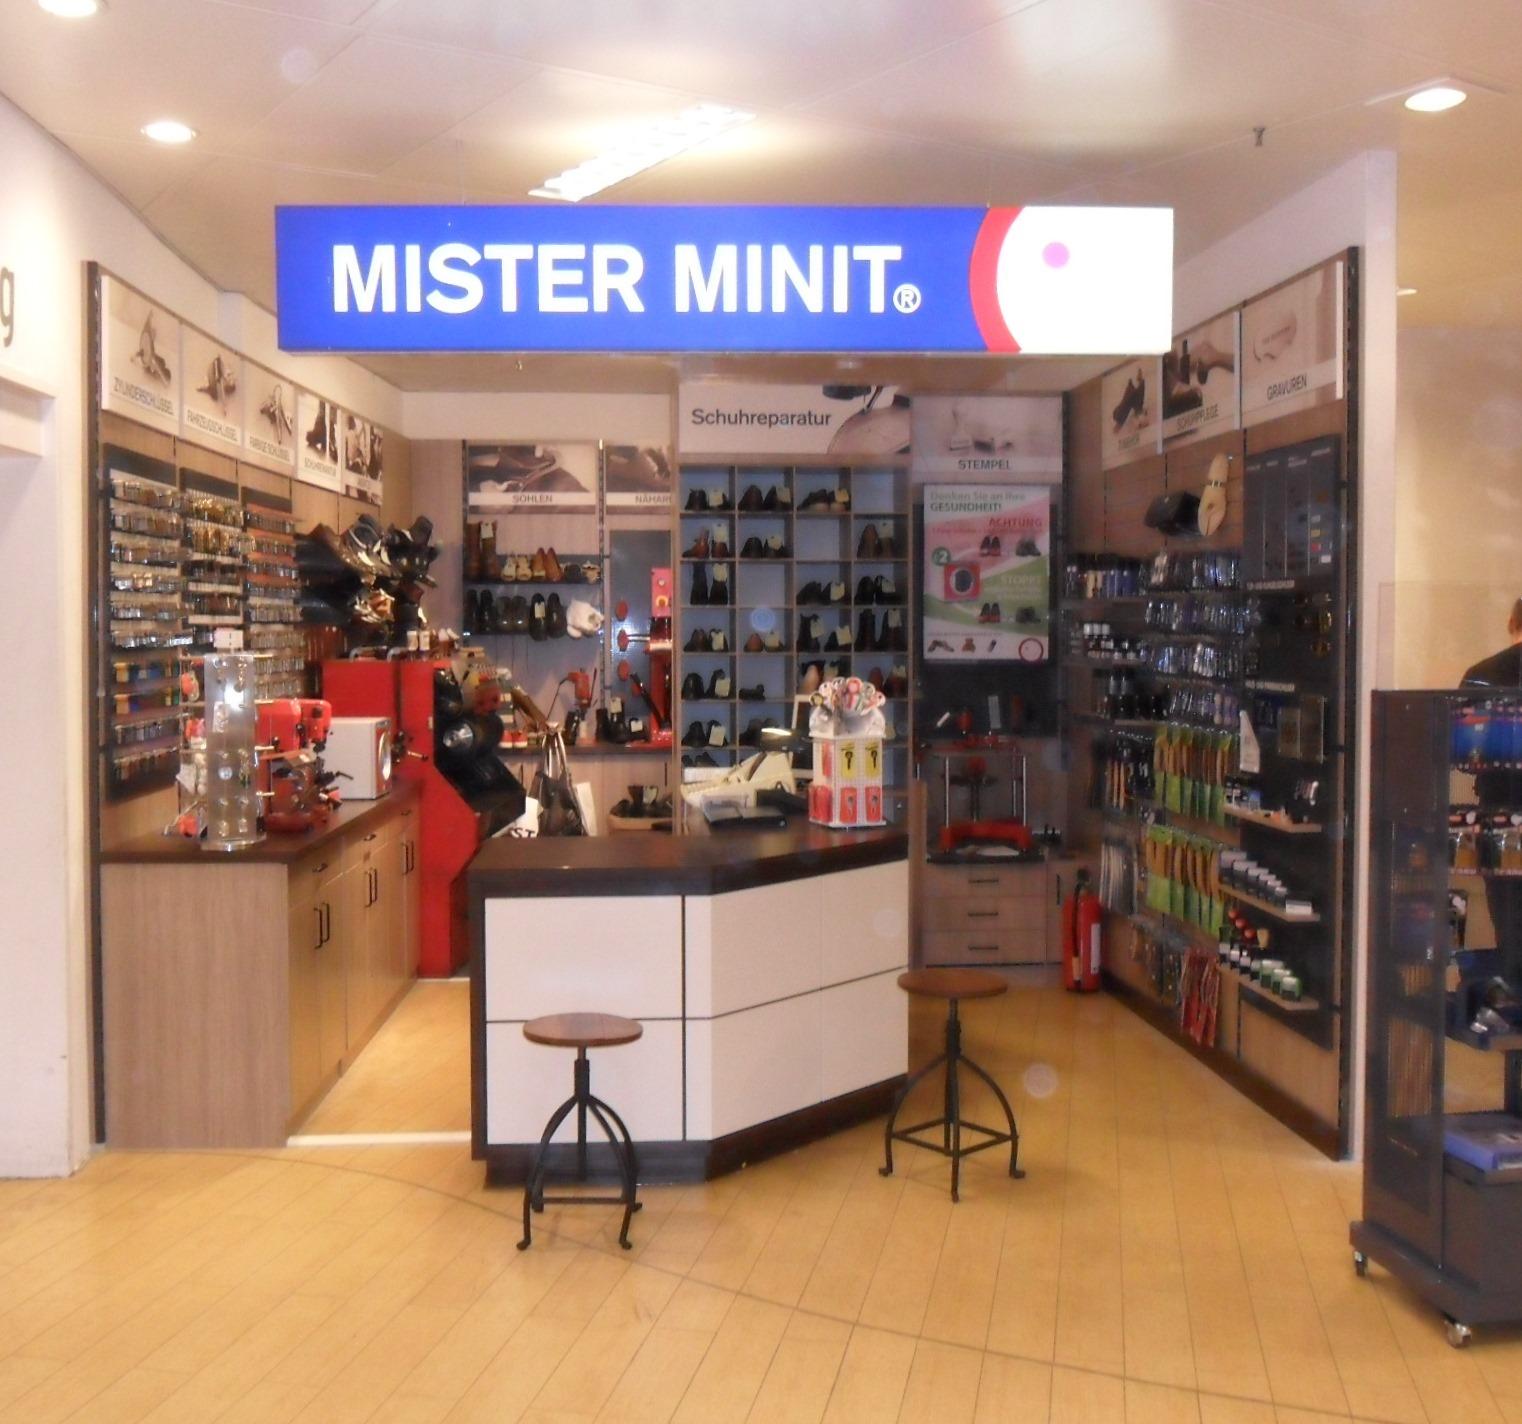 Mister Minit Karstadt Lörrach MISTER MINIT